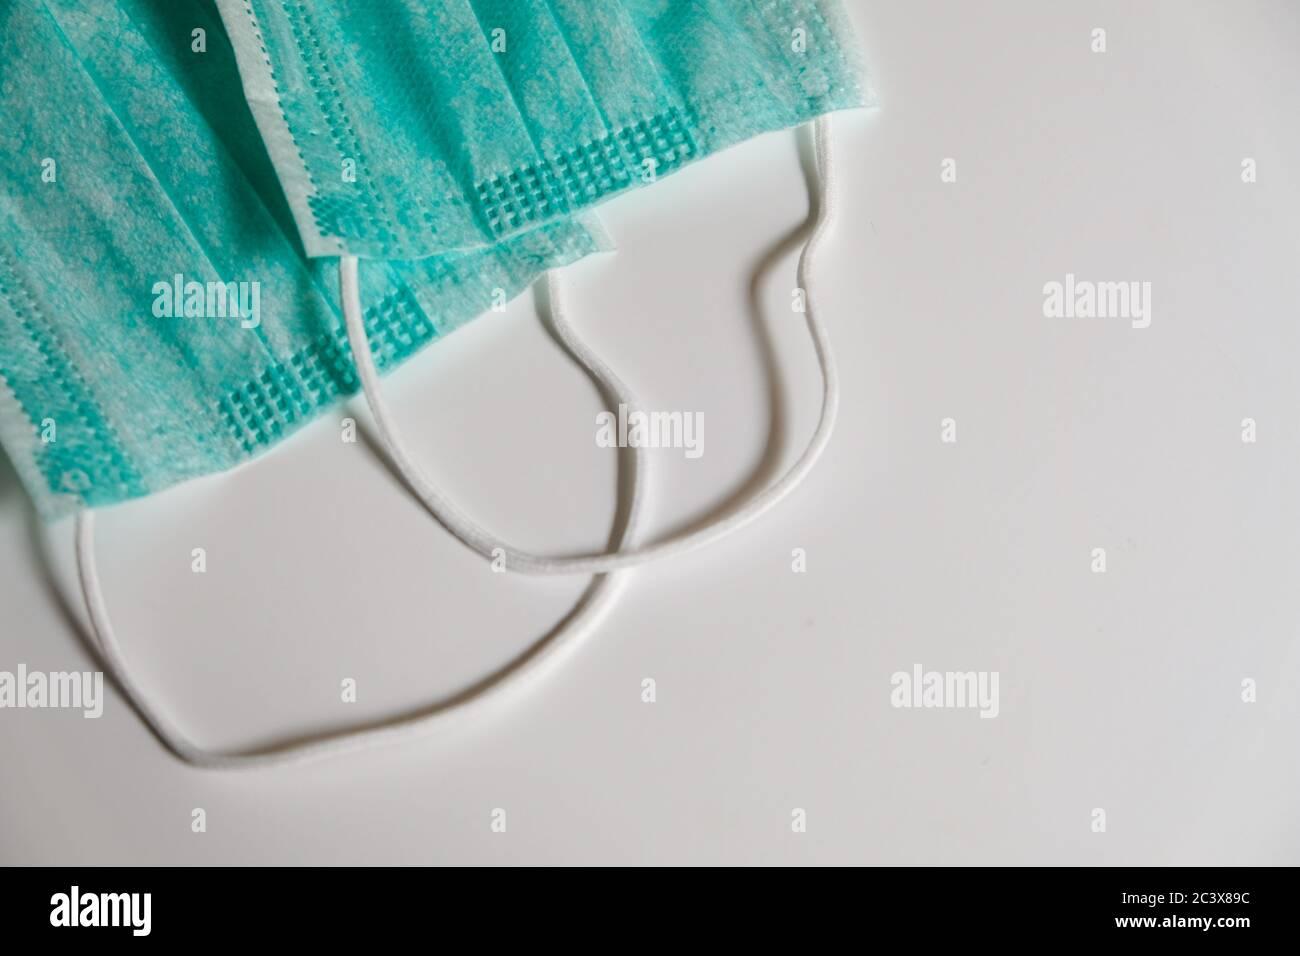 Dos máscaras médicas de cara azul estándar en una mesa blanca. Protección propia contra virus, bacterias, enfermedades, corona o gripe. Métodos de prevención Foto de stock